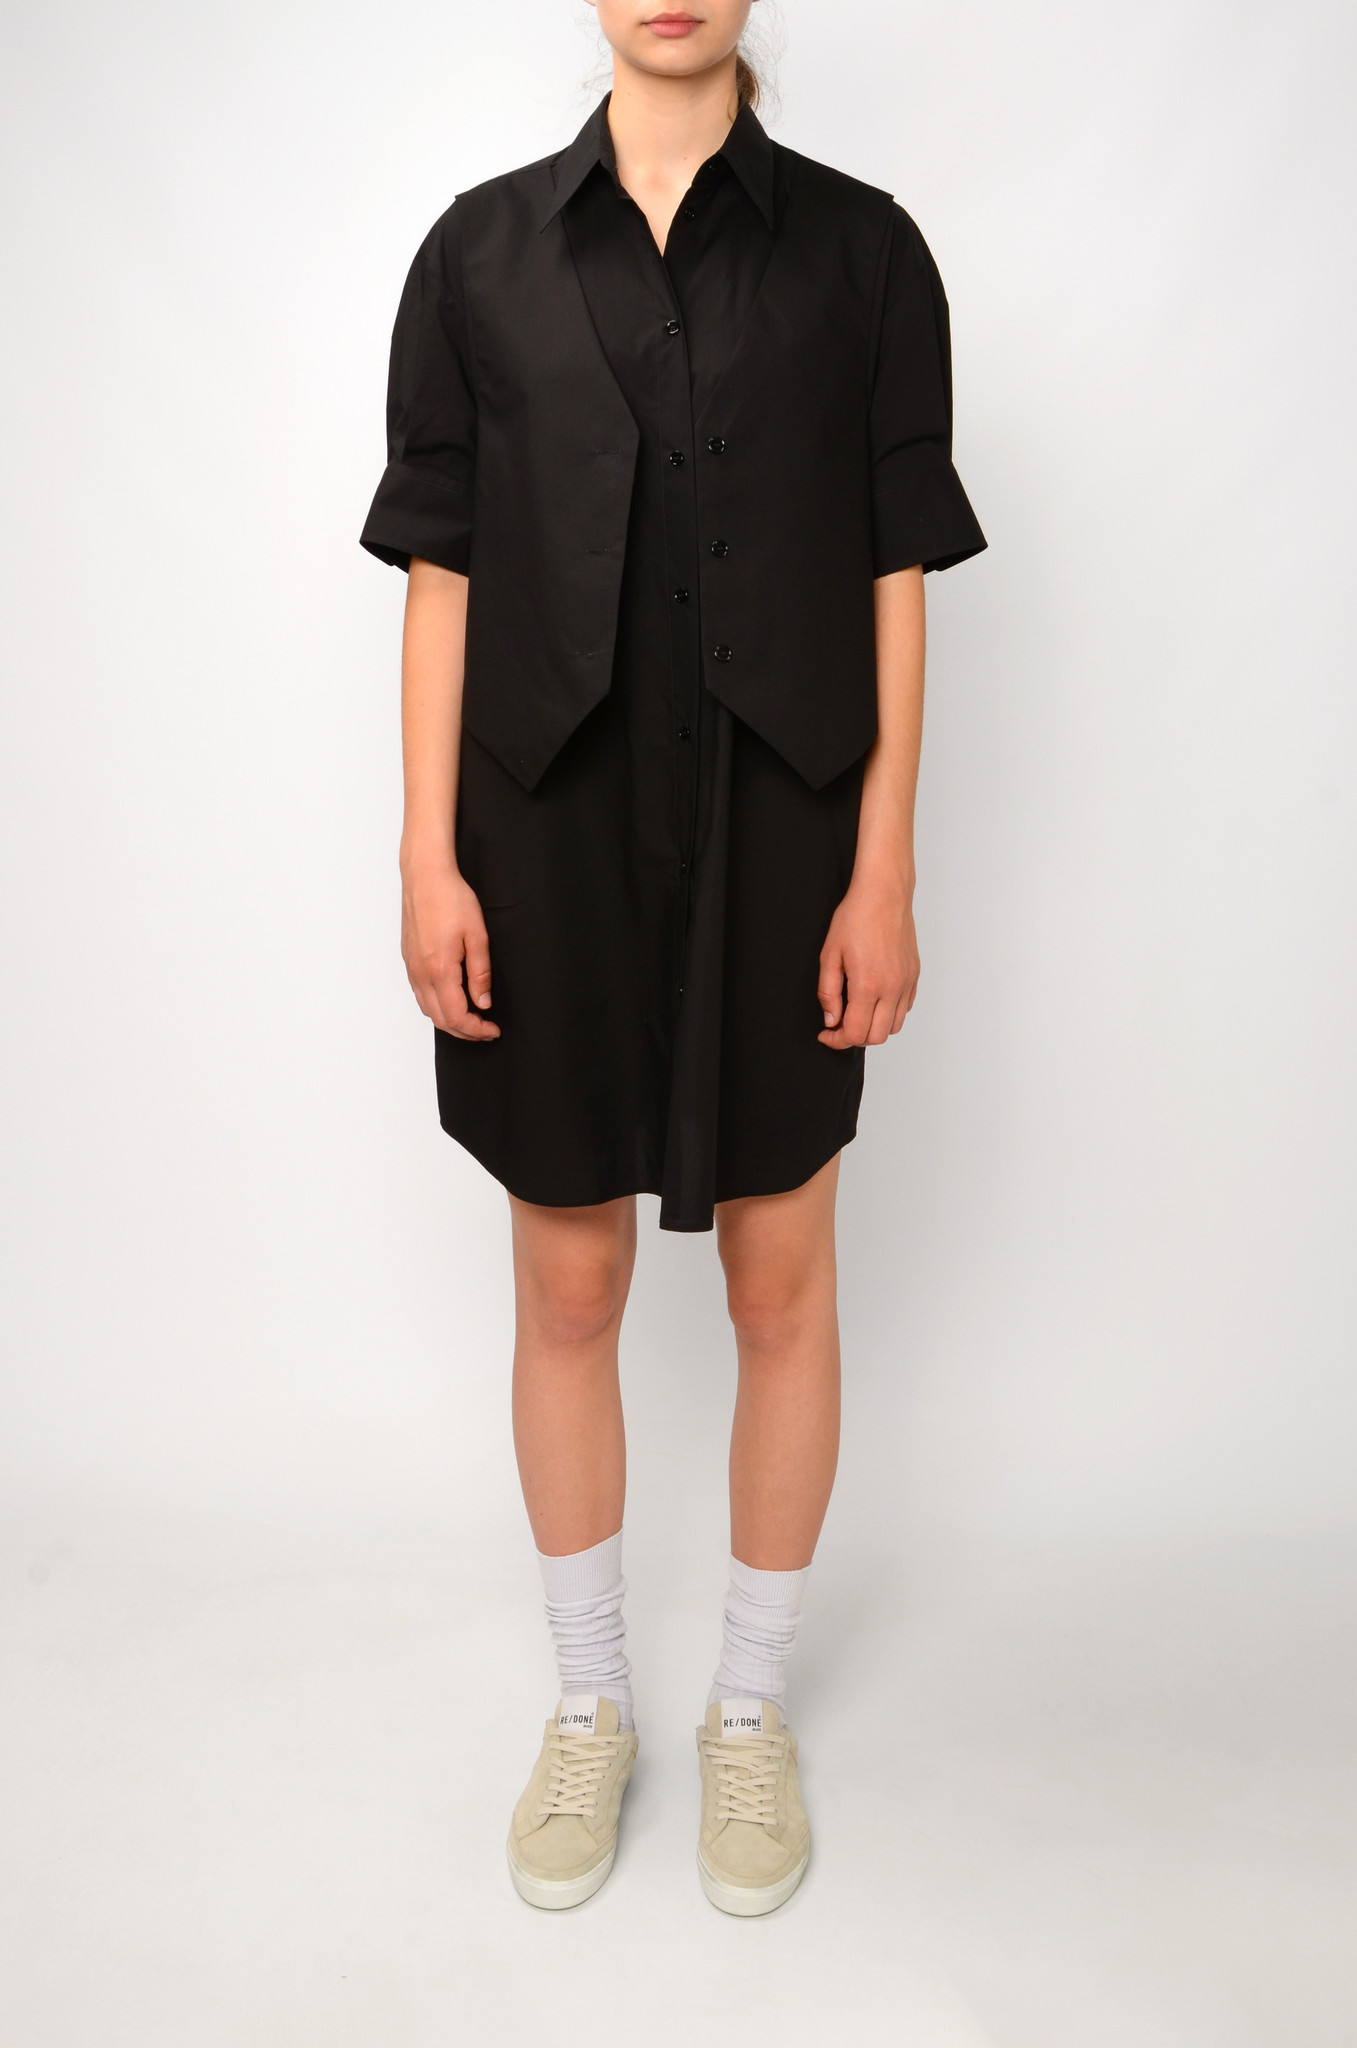 WAISTCOAT SHIRT DRESS IN BLACK-1